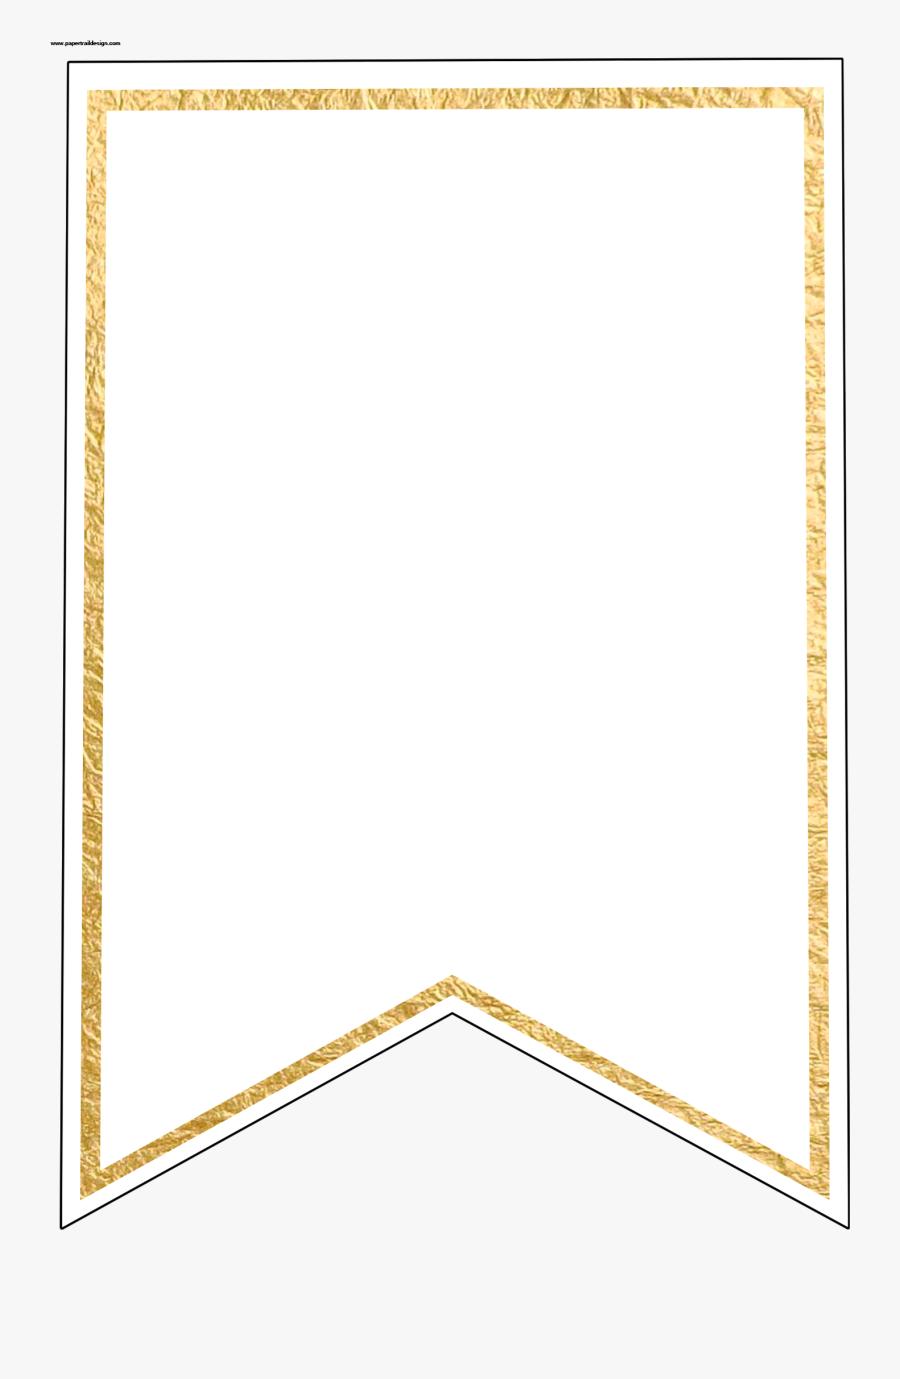 Gold Pennant Banner Blank Template Flag Banner Template - Transparent Background Banner Blank Template, Transparent Clipart